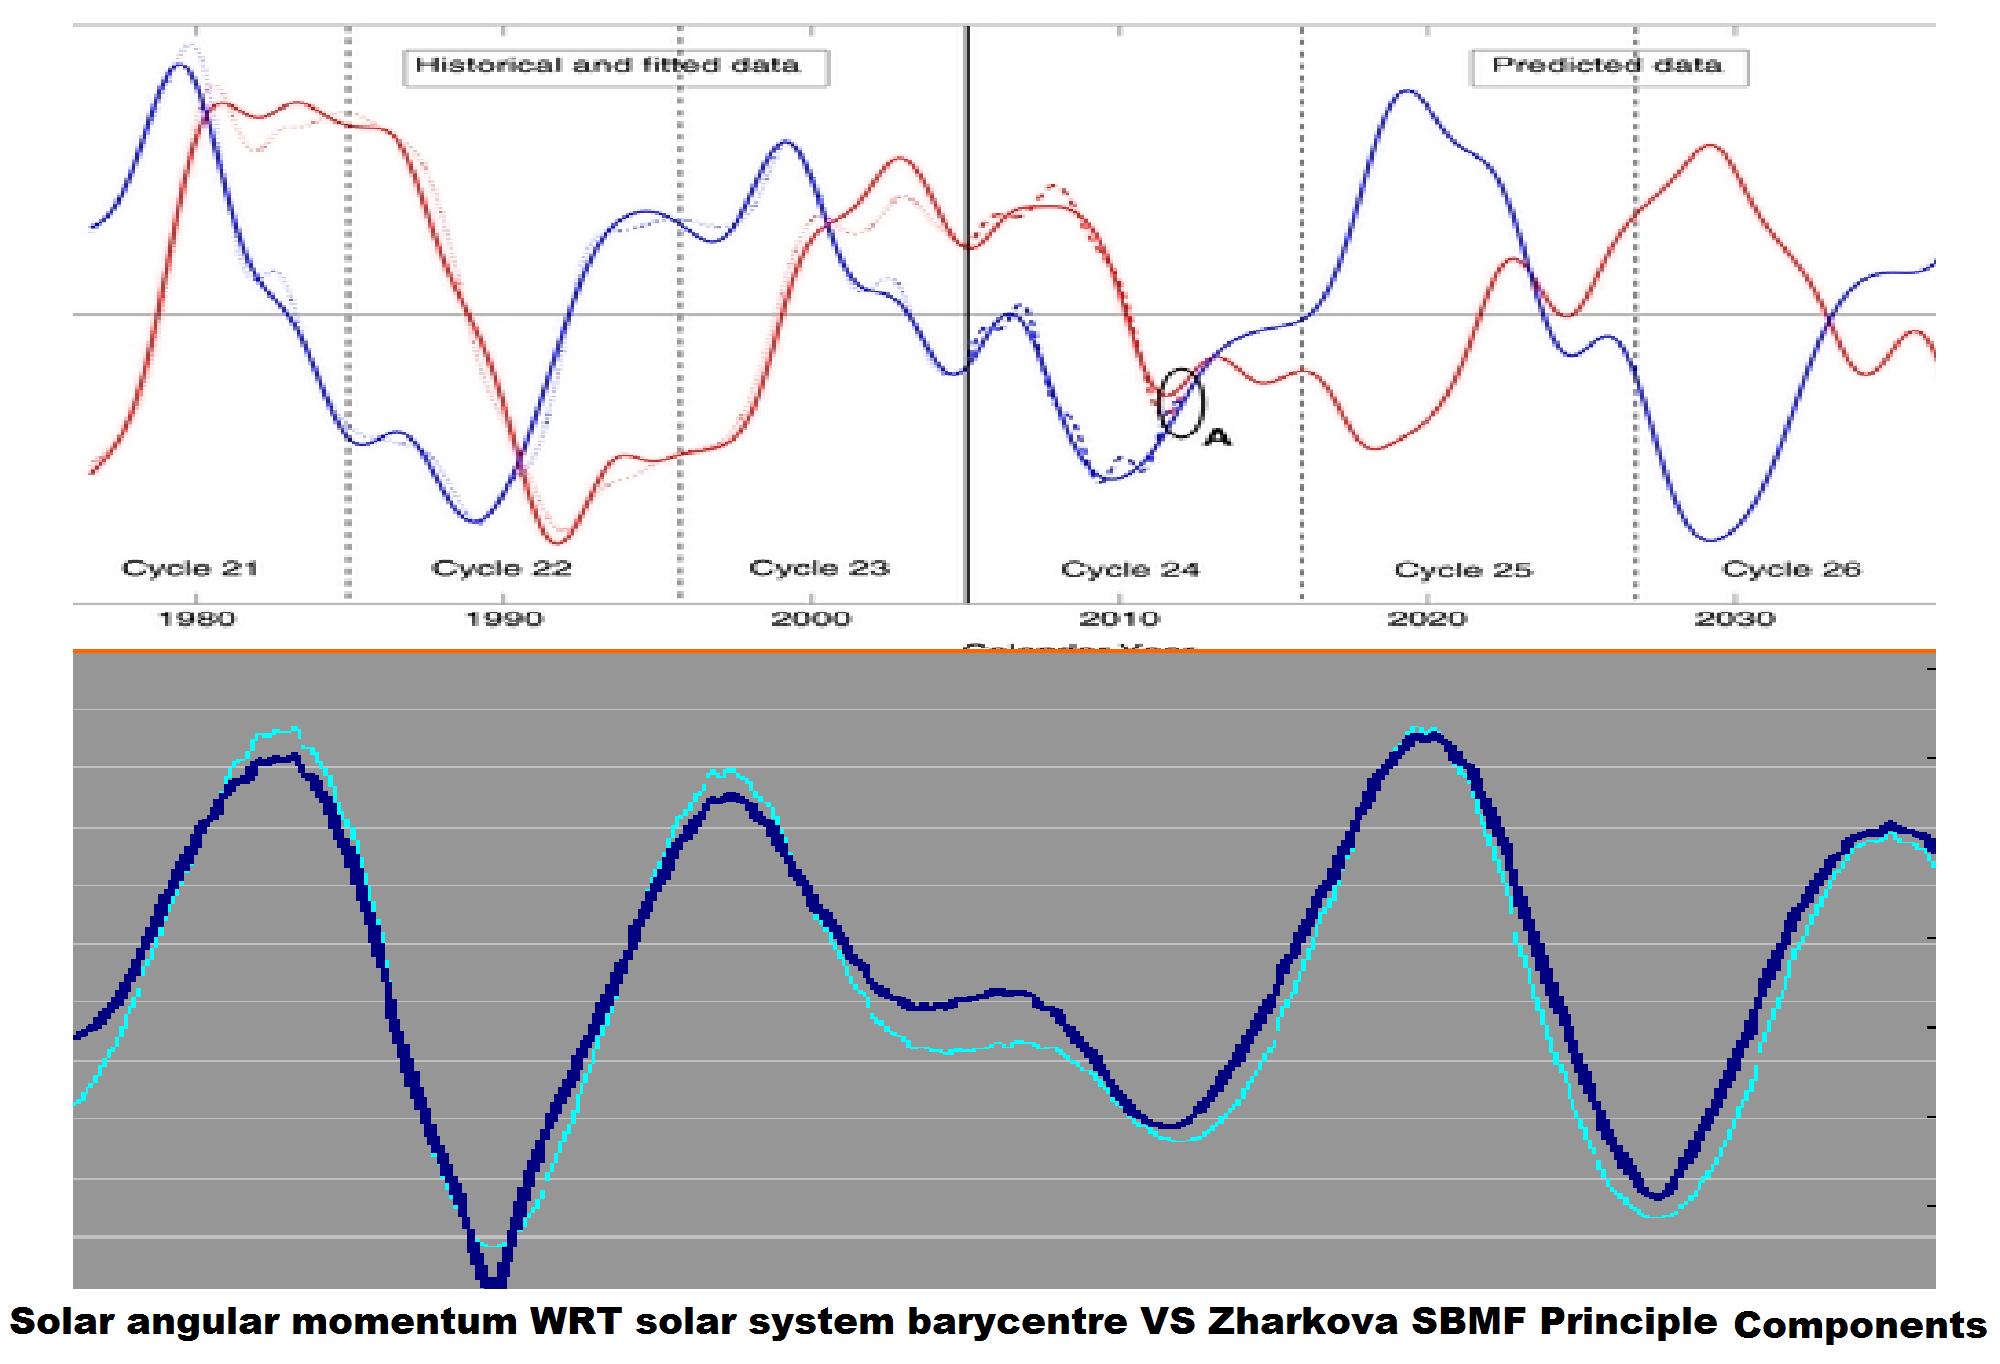 Major breakthrough in solar-planetary theory: Barycentre